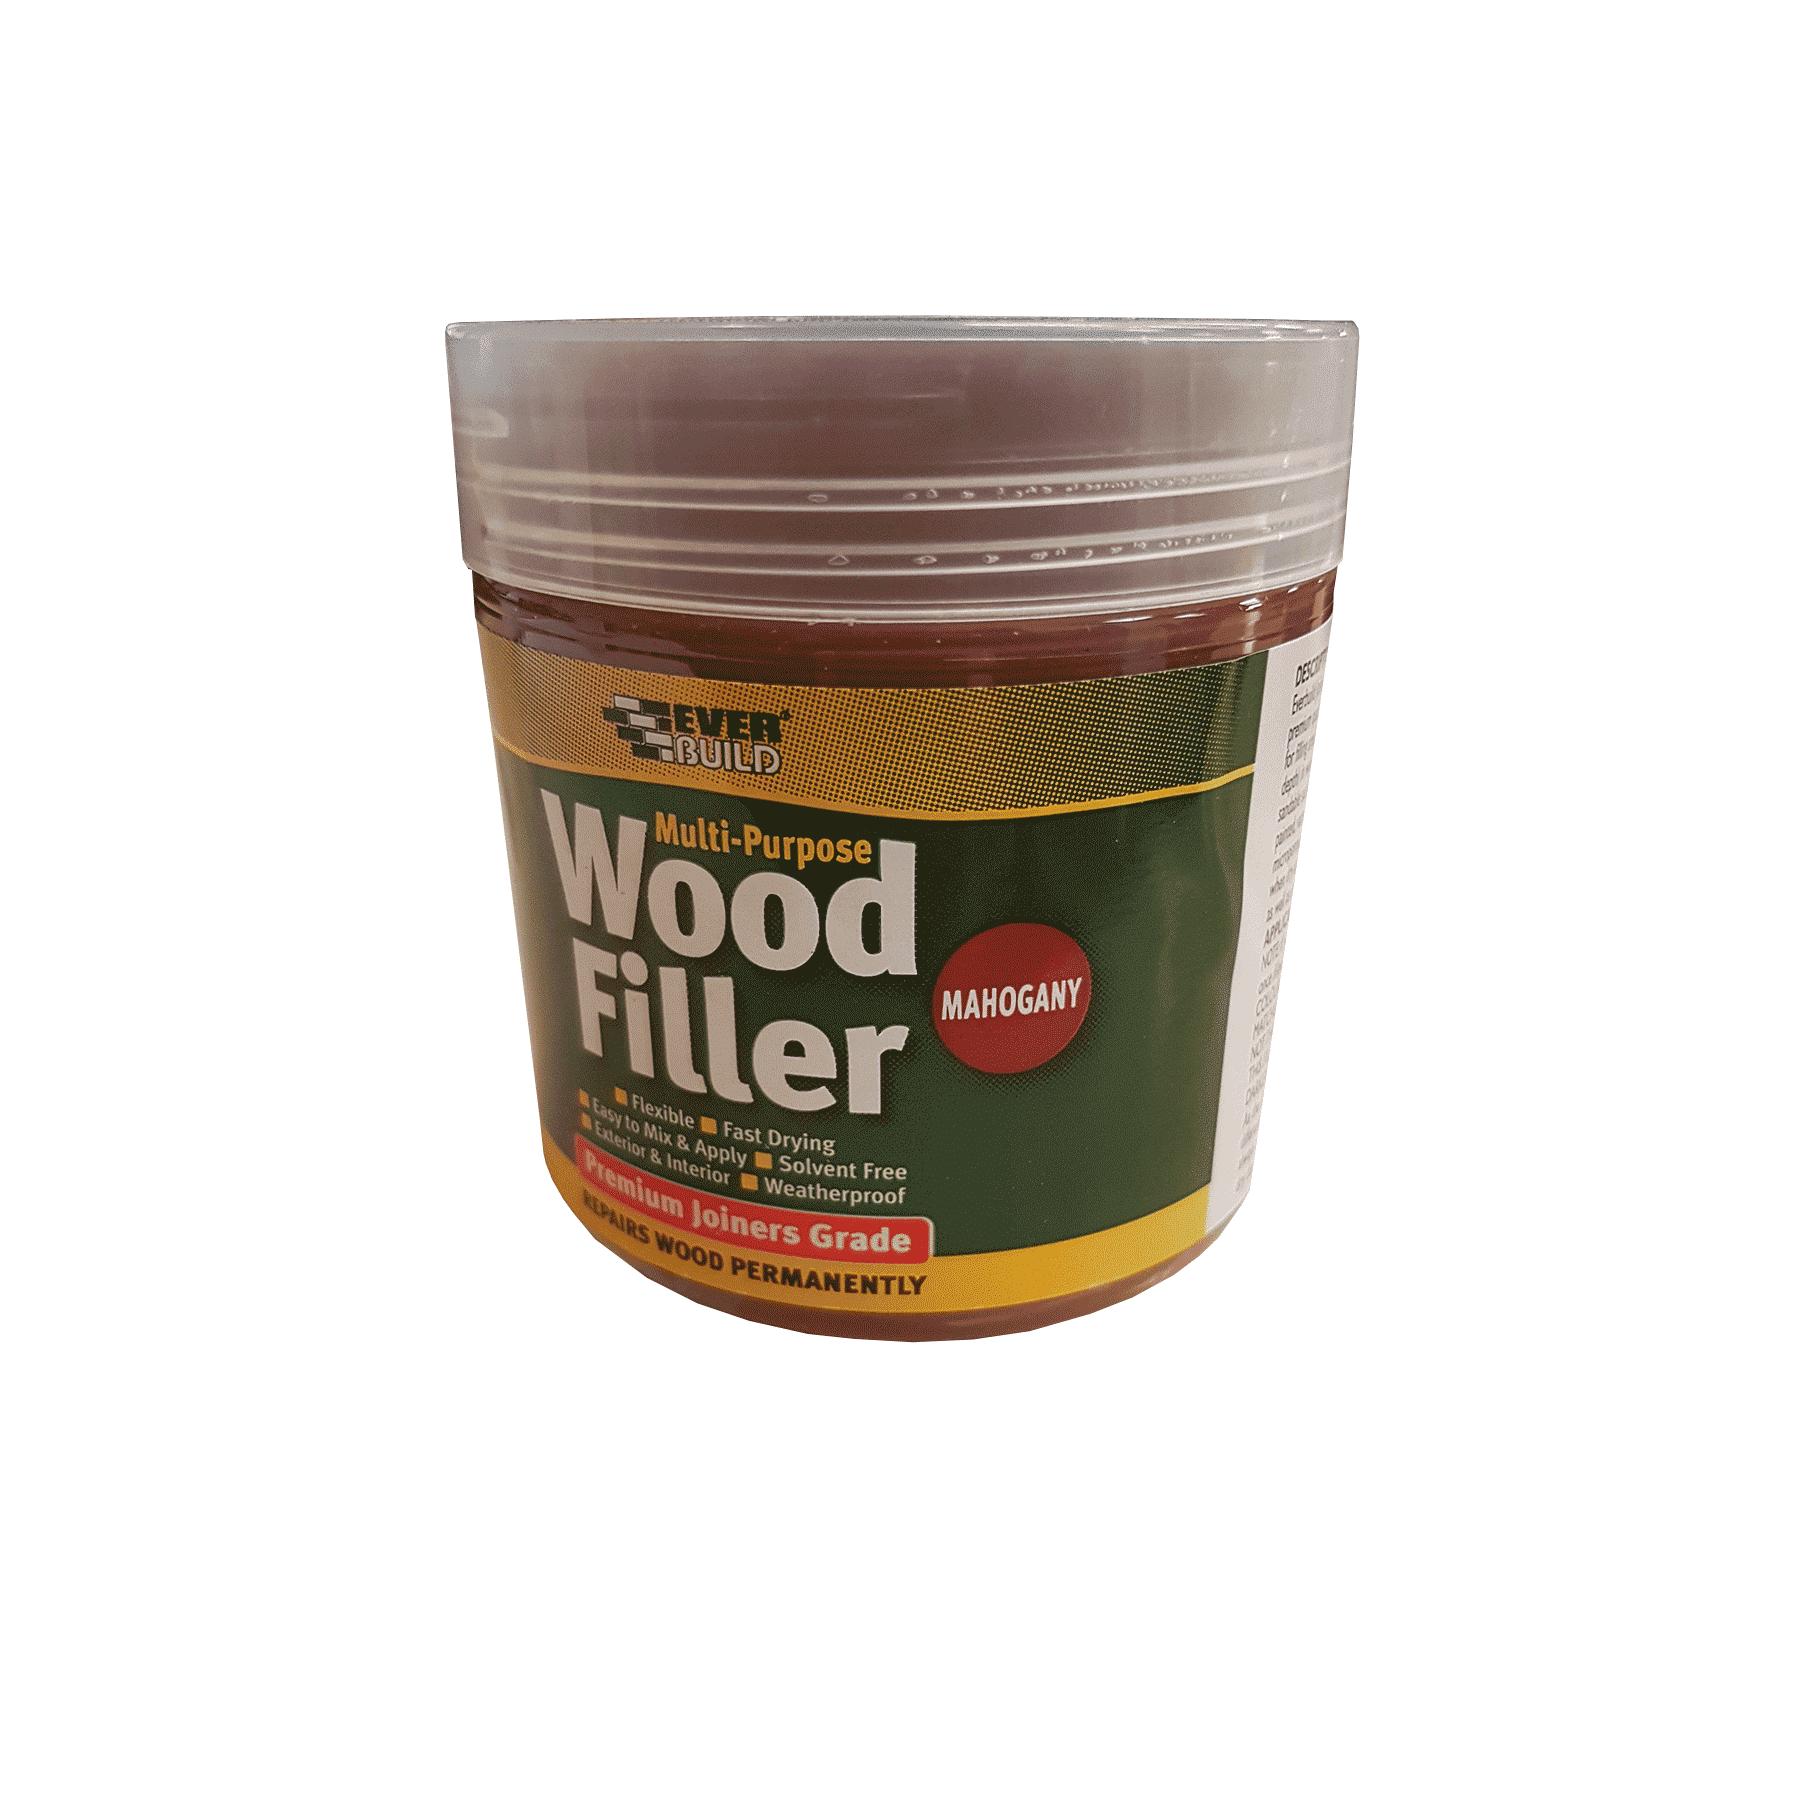 Wood Filler Mahogany